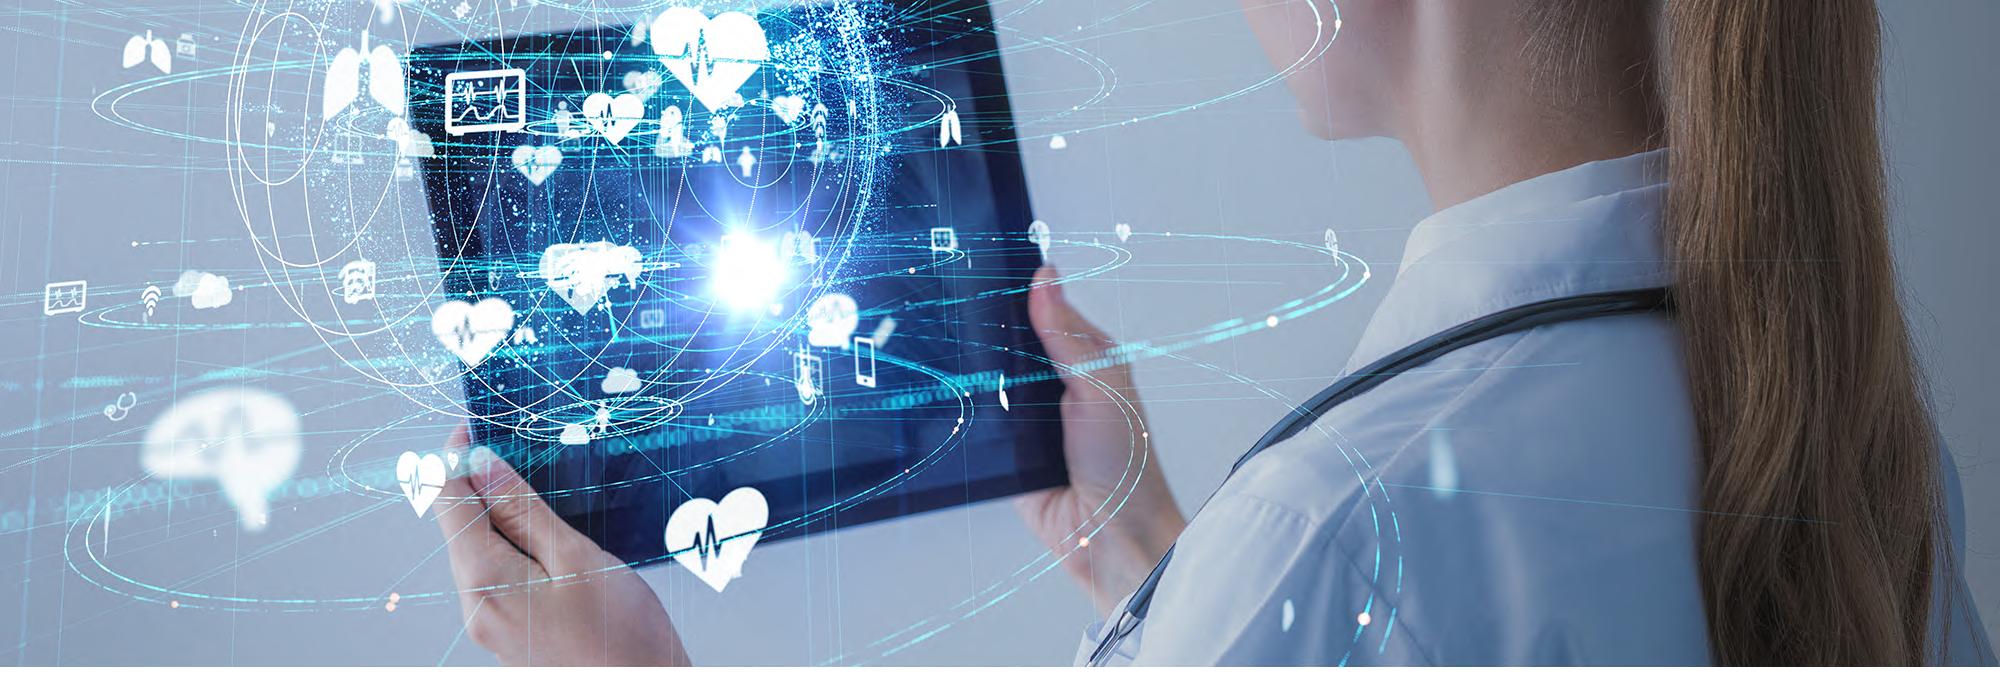 iDesign | News | Nation's Top Nursing Schools Tap iDesign to Scale Innovative Programs